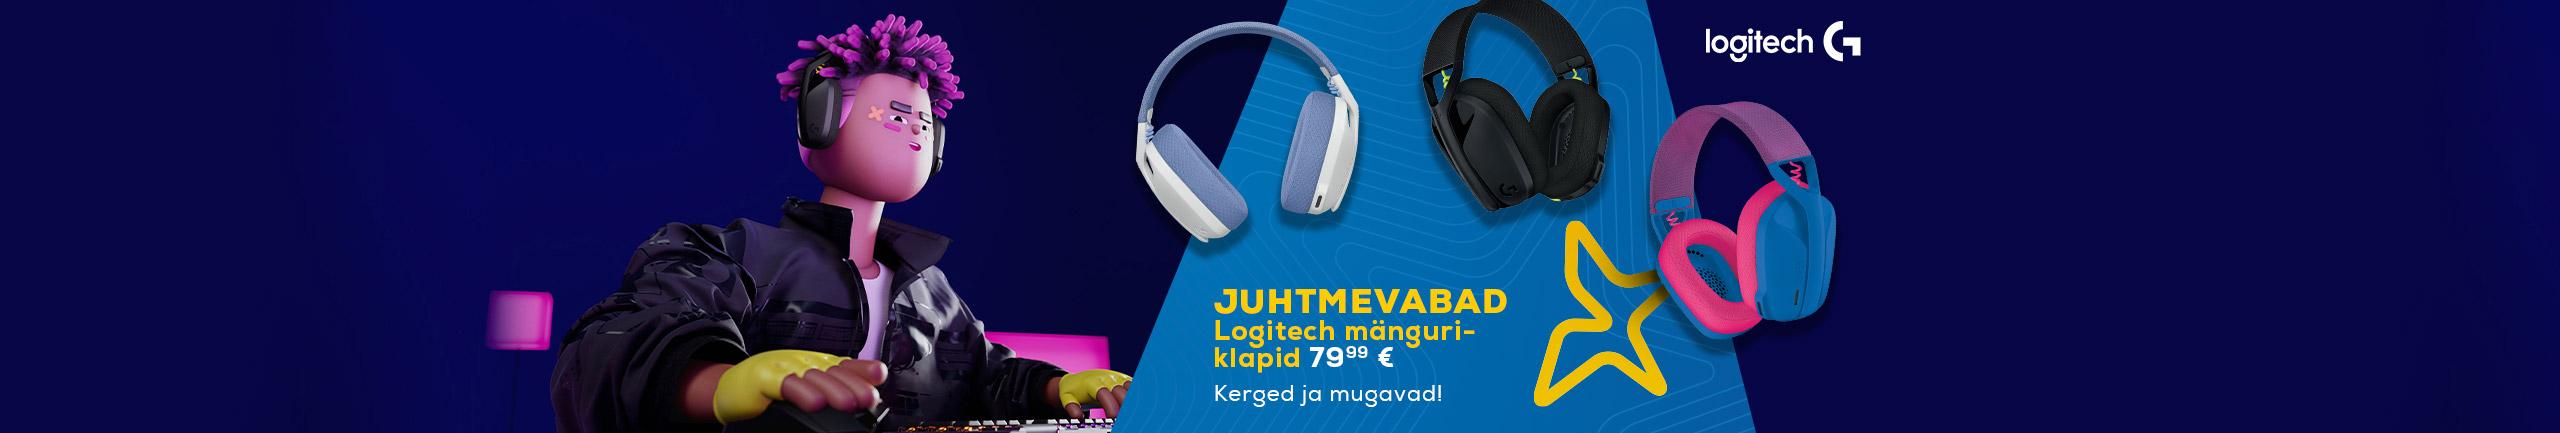 Wireless Logitech gaming headset 79,99€